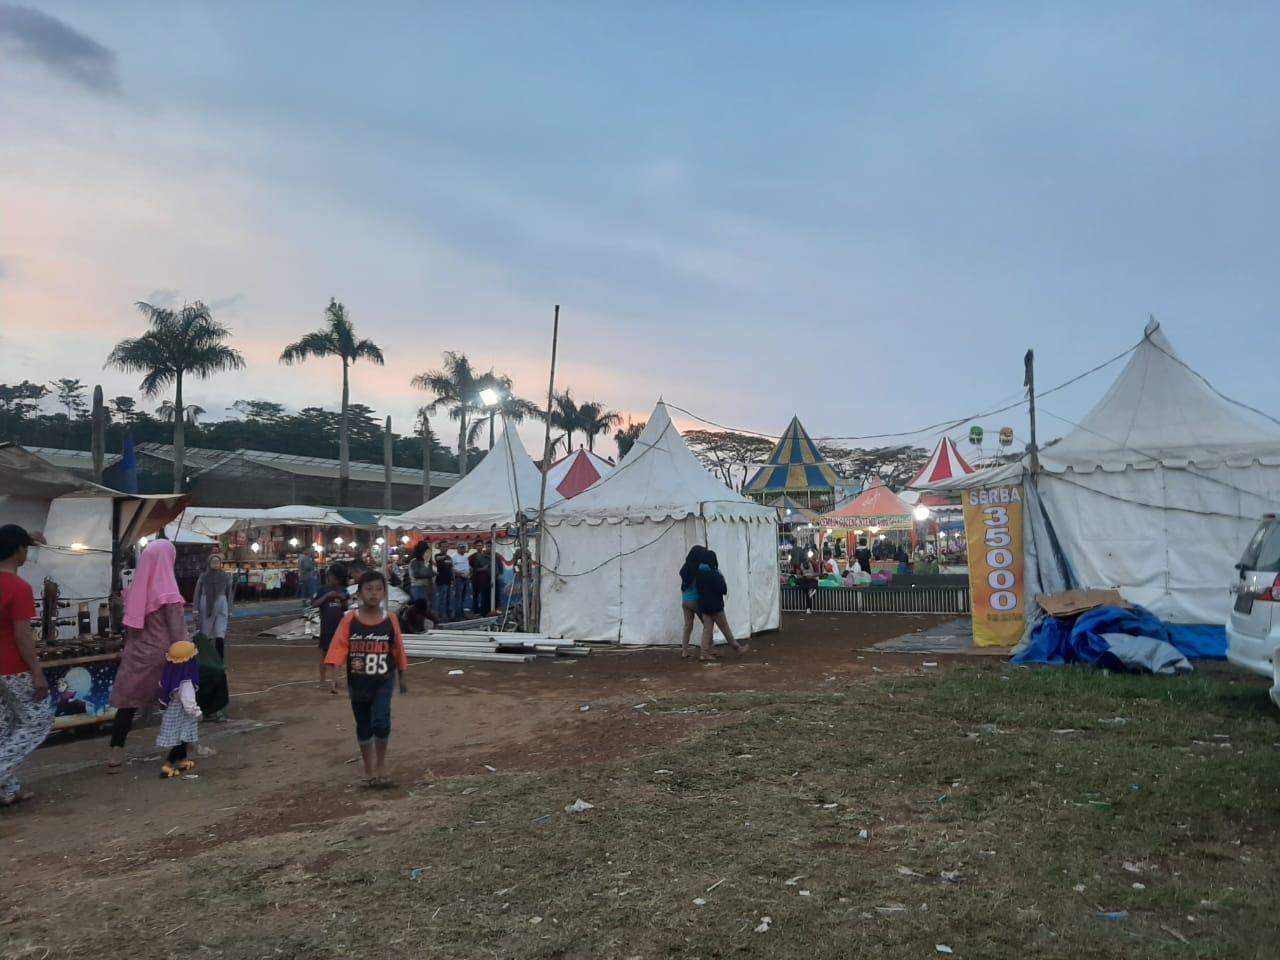 Pjs Bupati Cianjur Akan Terjunkan Satpol PP Tertibkan Pasar Malam Di Kecamatan Pacet